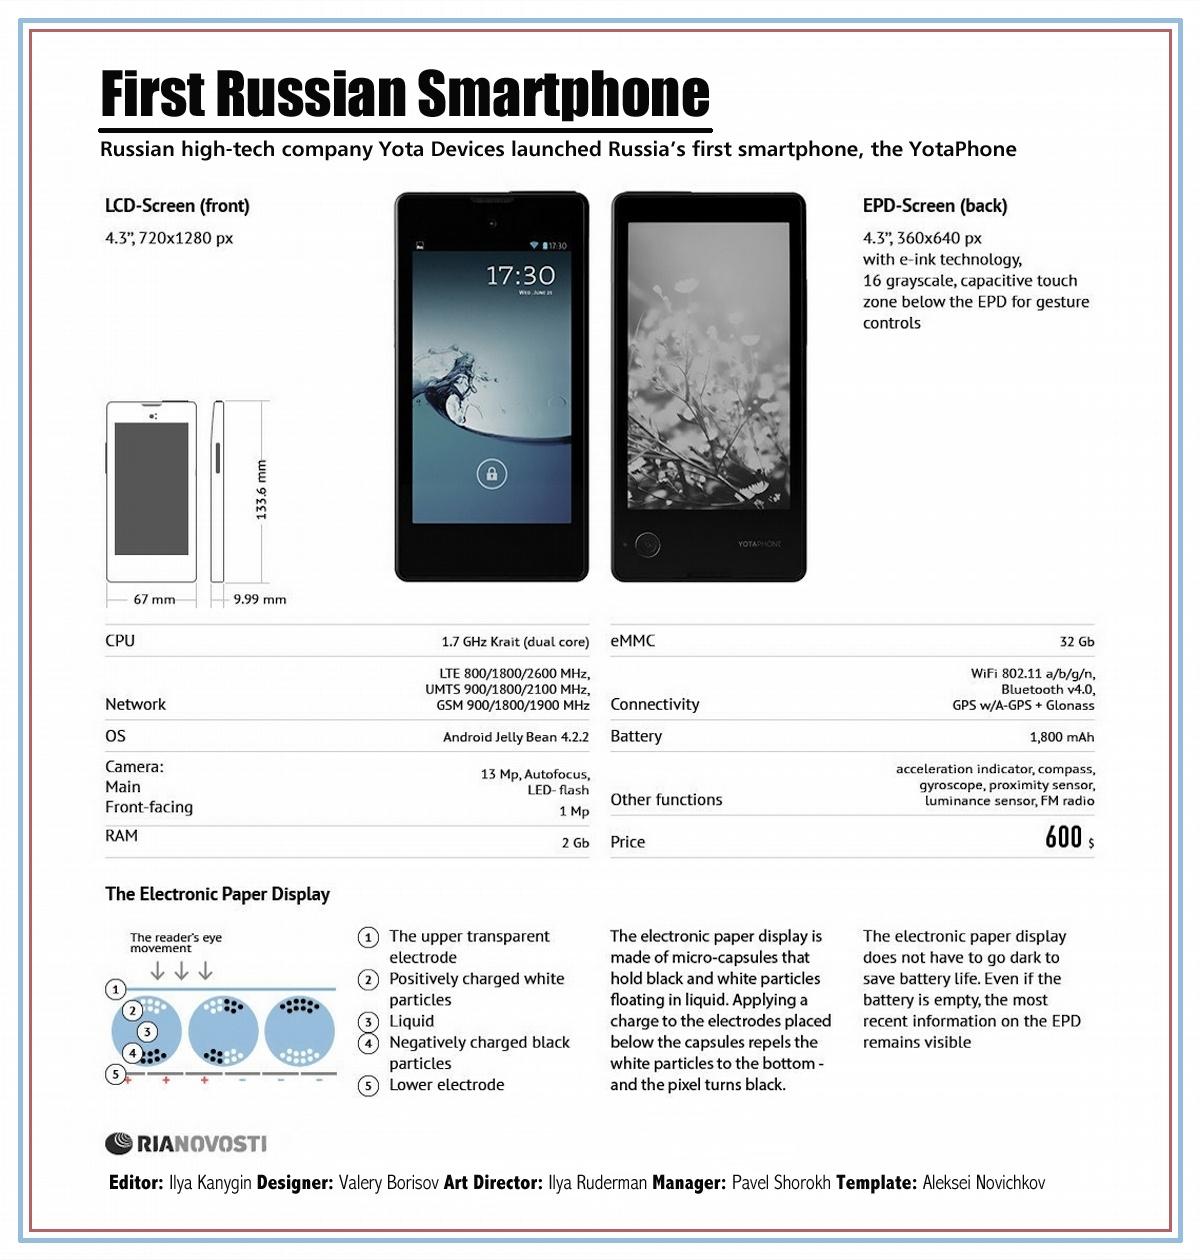 00 RIA-Novosti Infographics. First Russian Smartphone. 2013